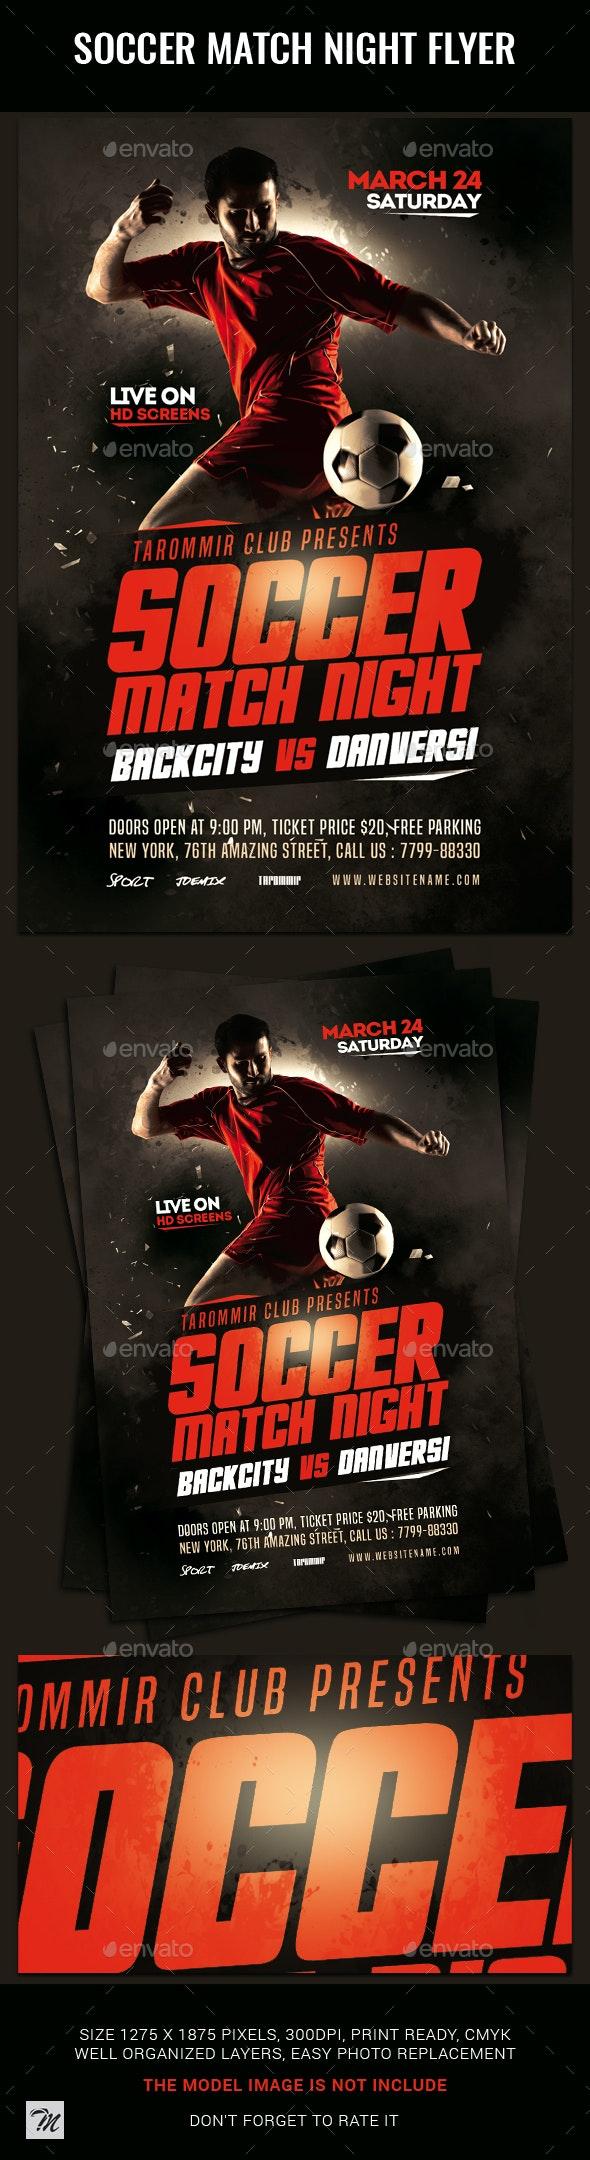 Soccer Match Night Flyer - Sports Events